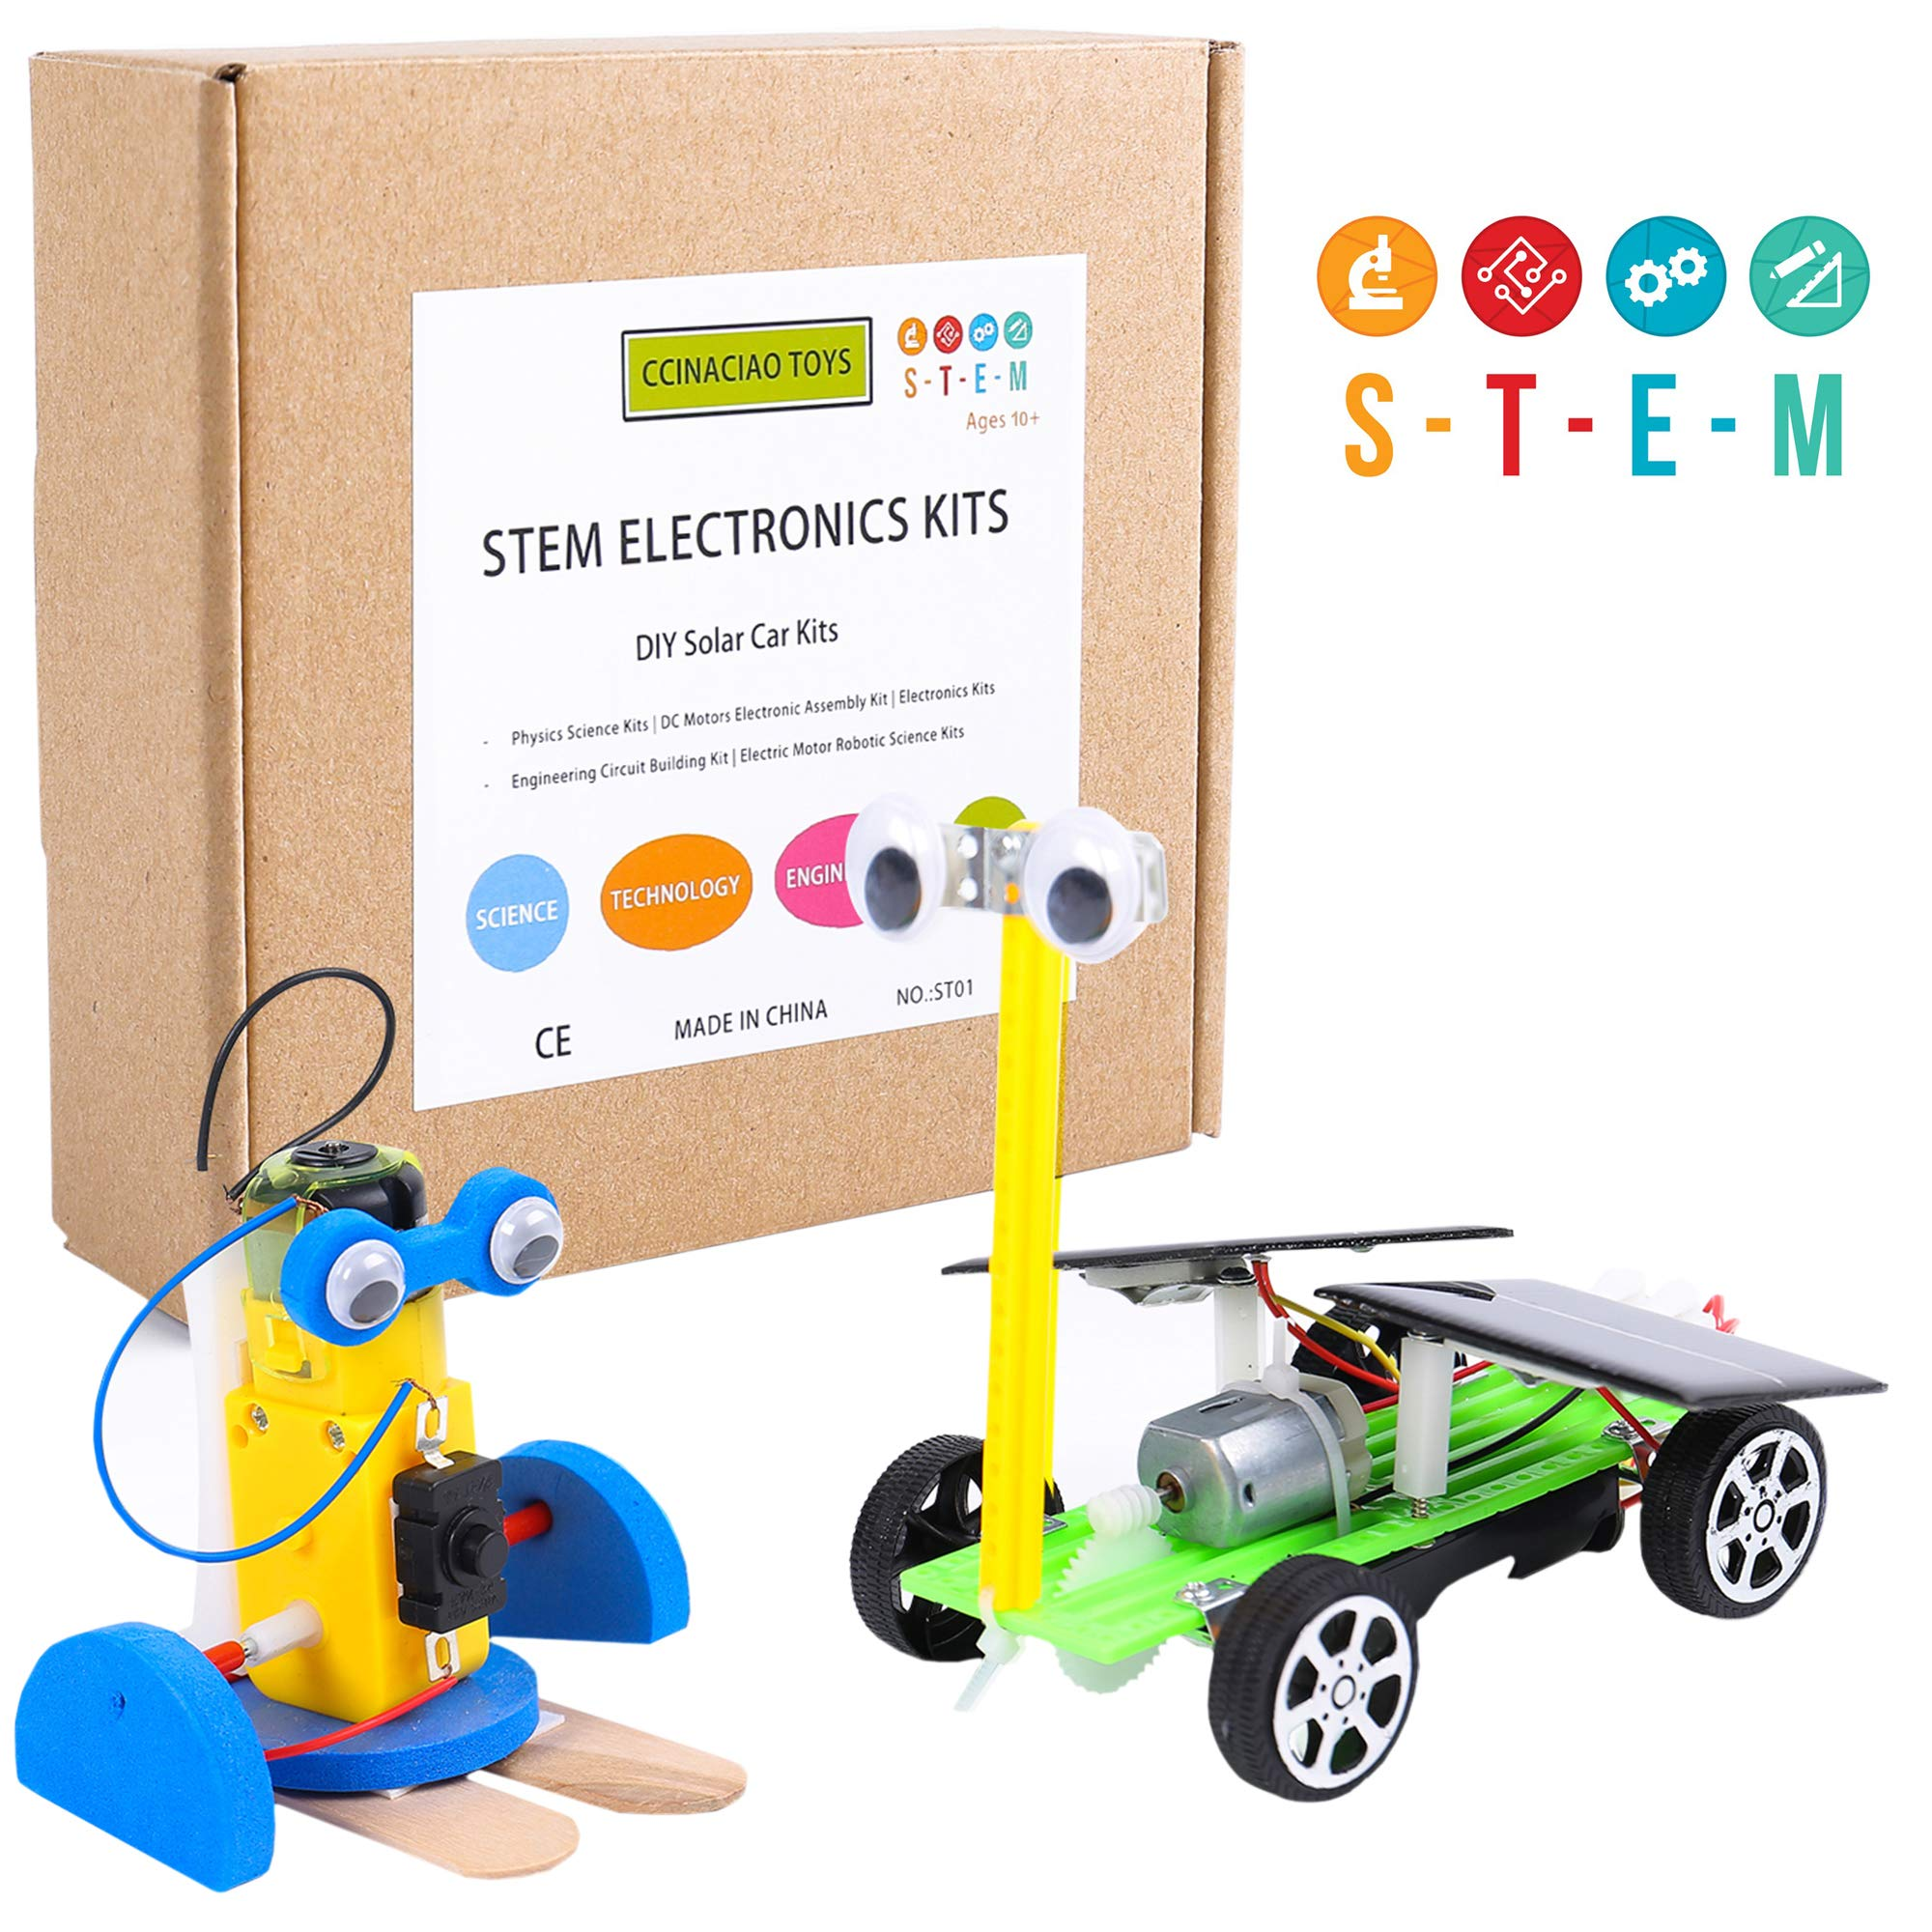 CCinaCiao Robotic Science Kits, DC Motors Electronic Assembly Kit, DIY Solar Car Kits, STEM Kits for Boys and Girls, Kids Science Experiment Kits(2 Kits) by CCinaCiao